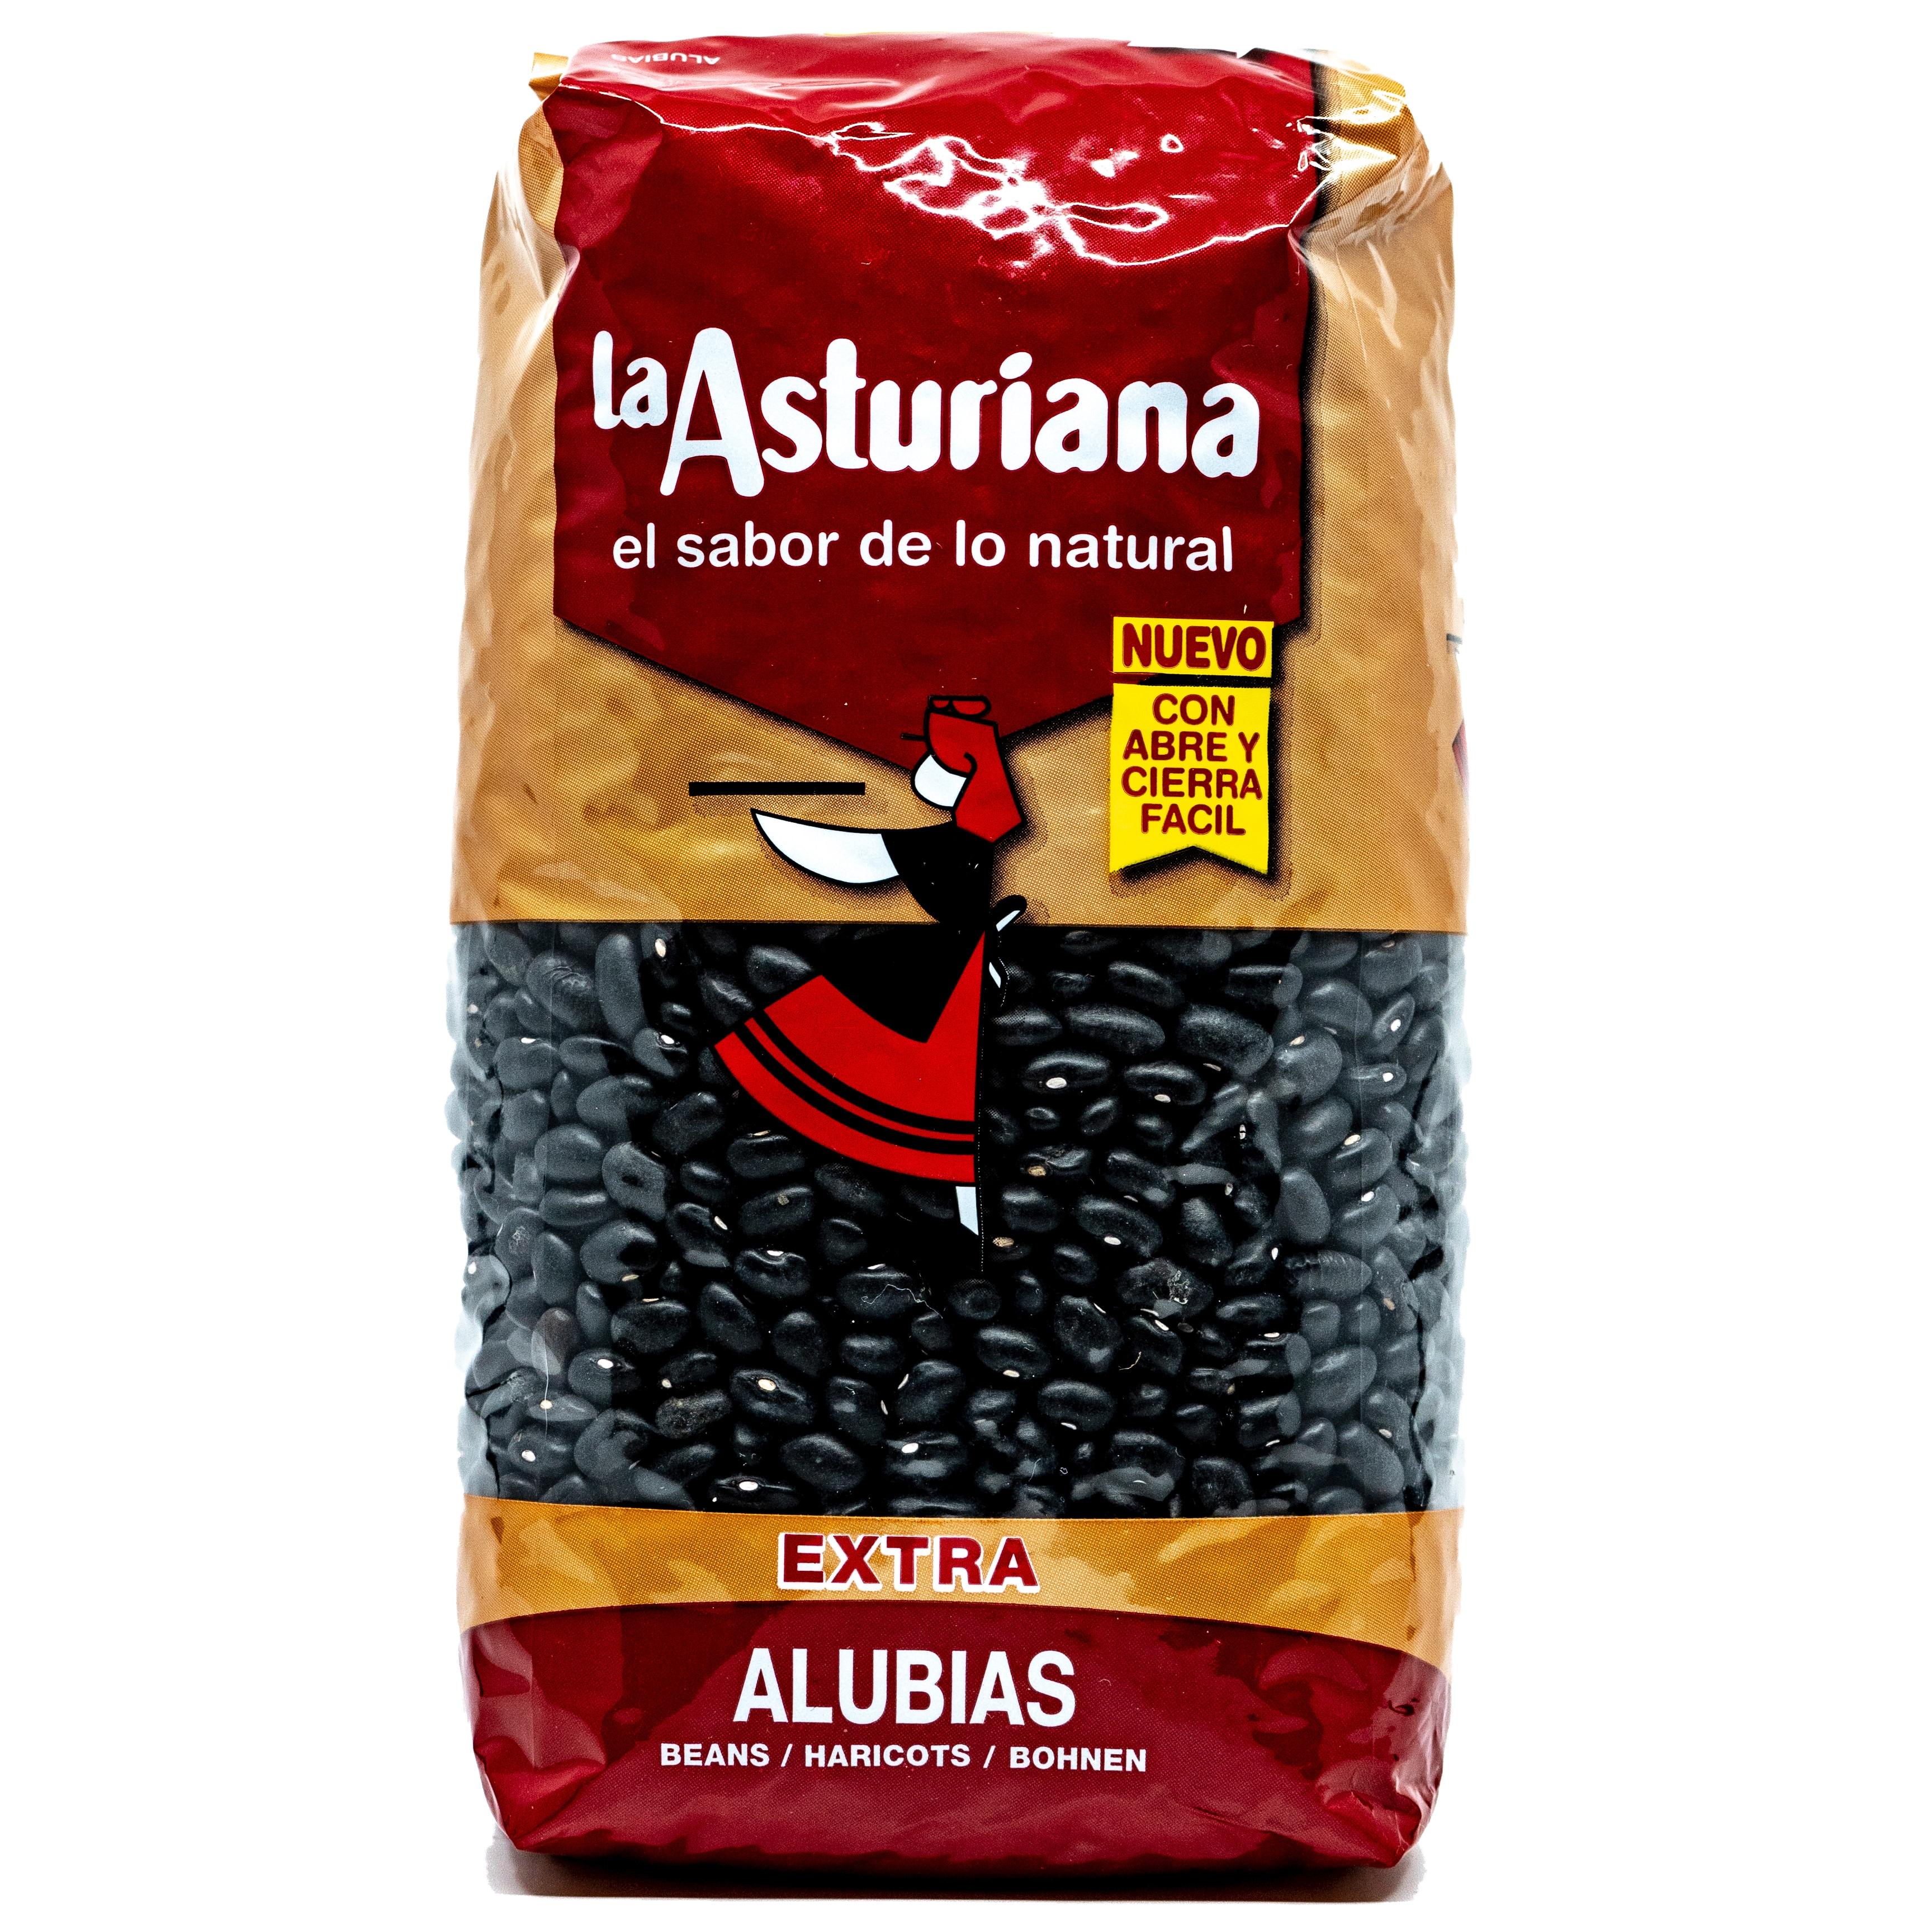 La Asturiana Alubias schwarze Bohnen 1kg